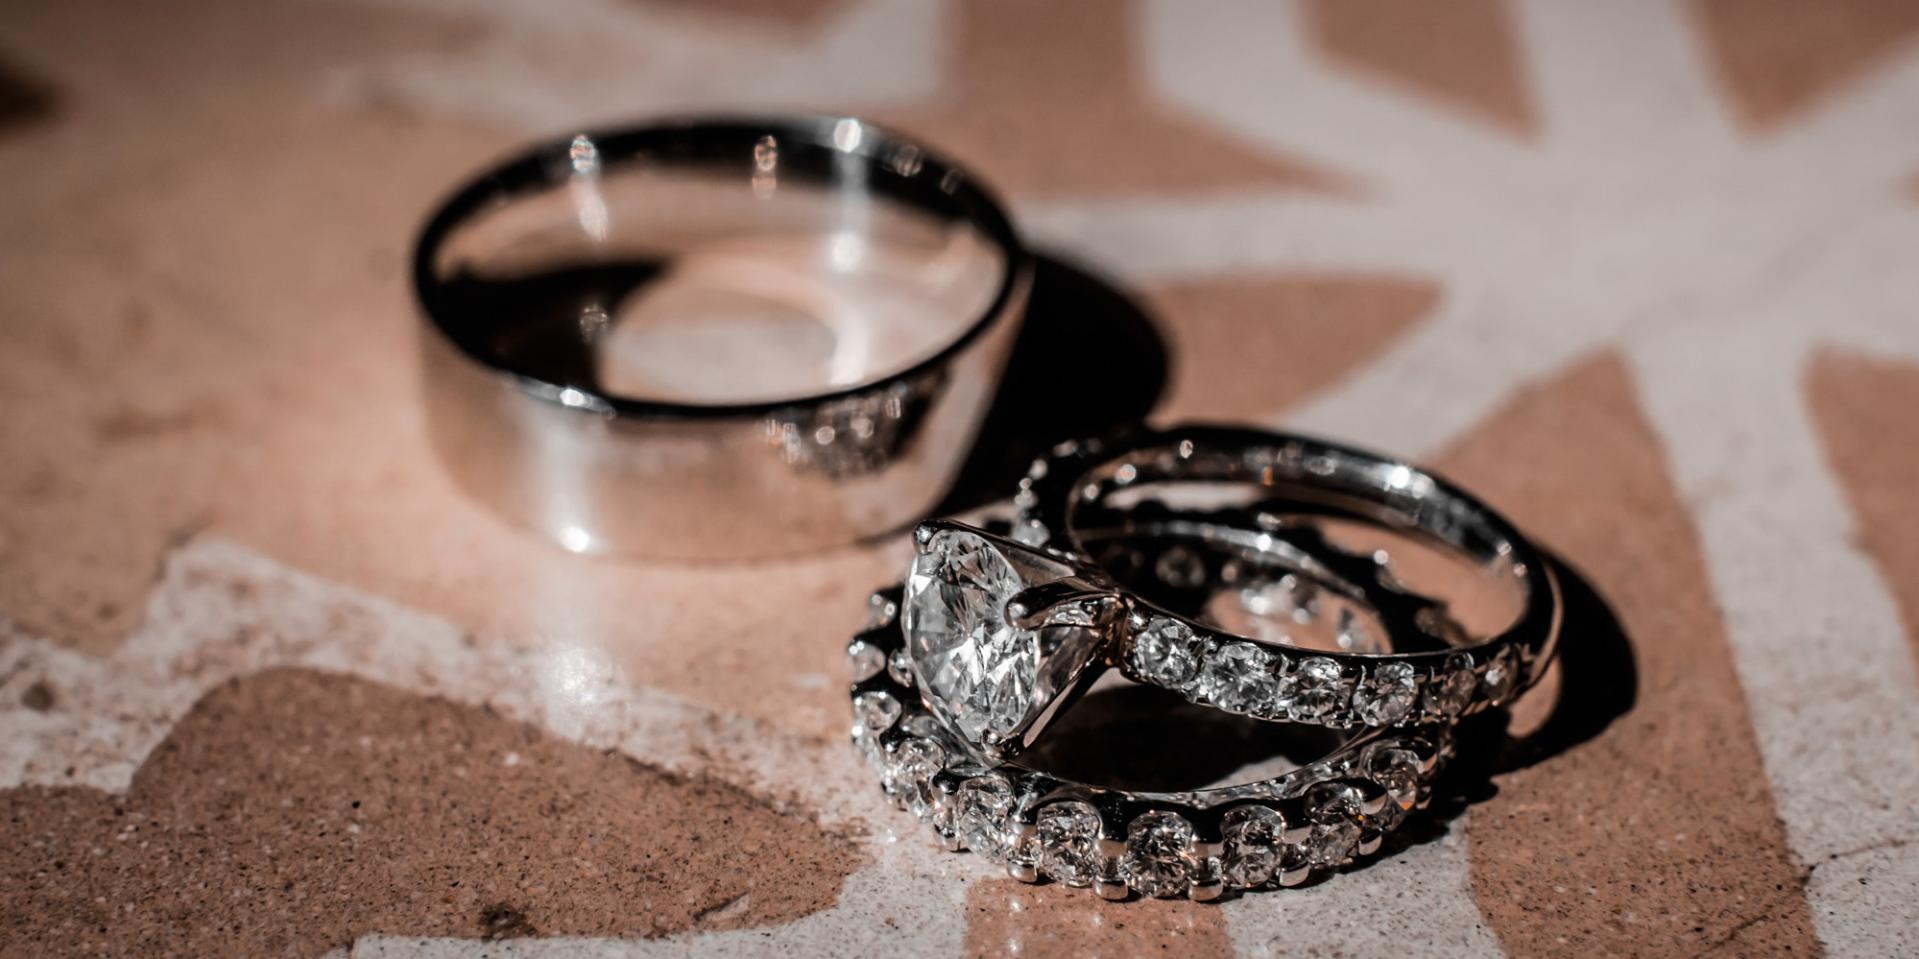 bodas-sin-clasificar-sin-tema-cuba-27481.jpg